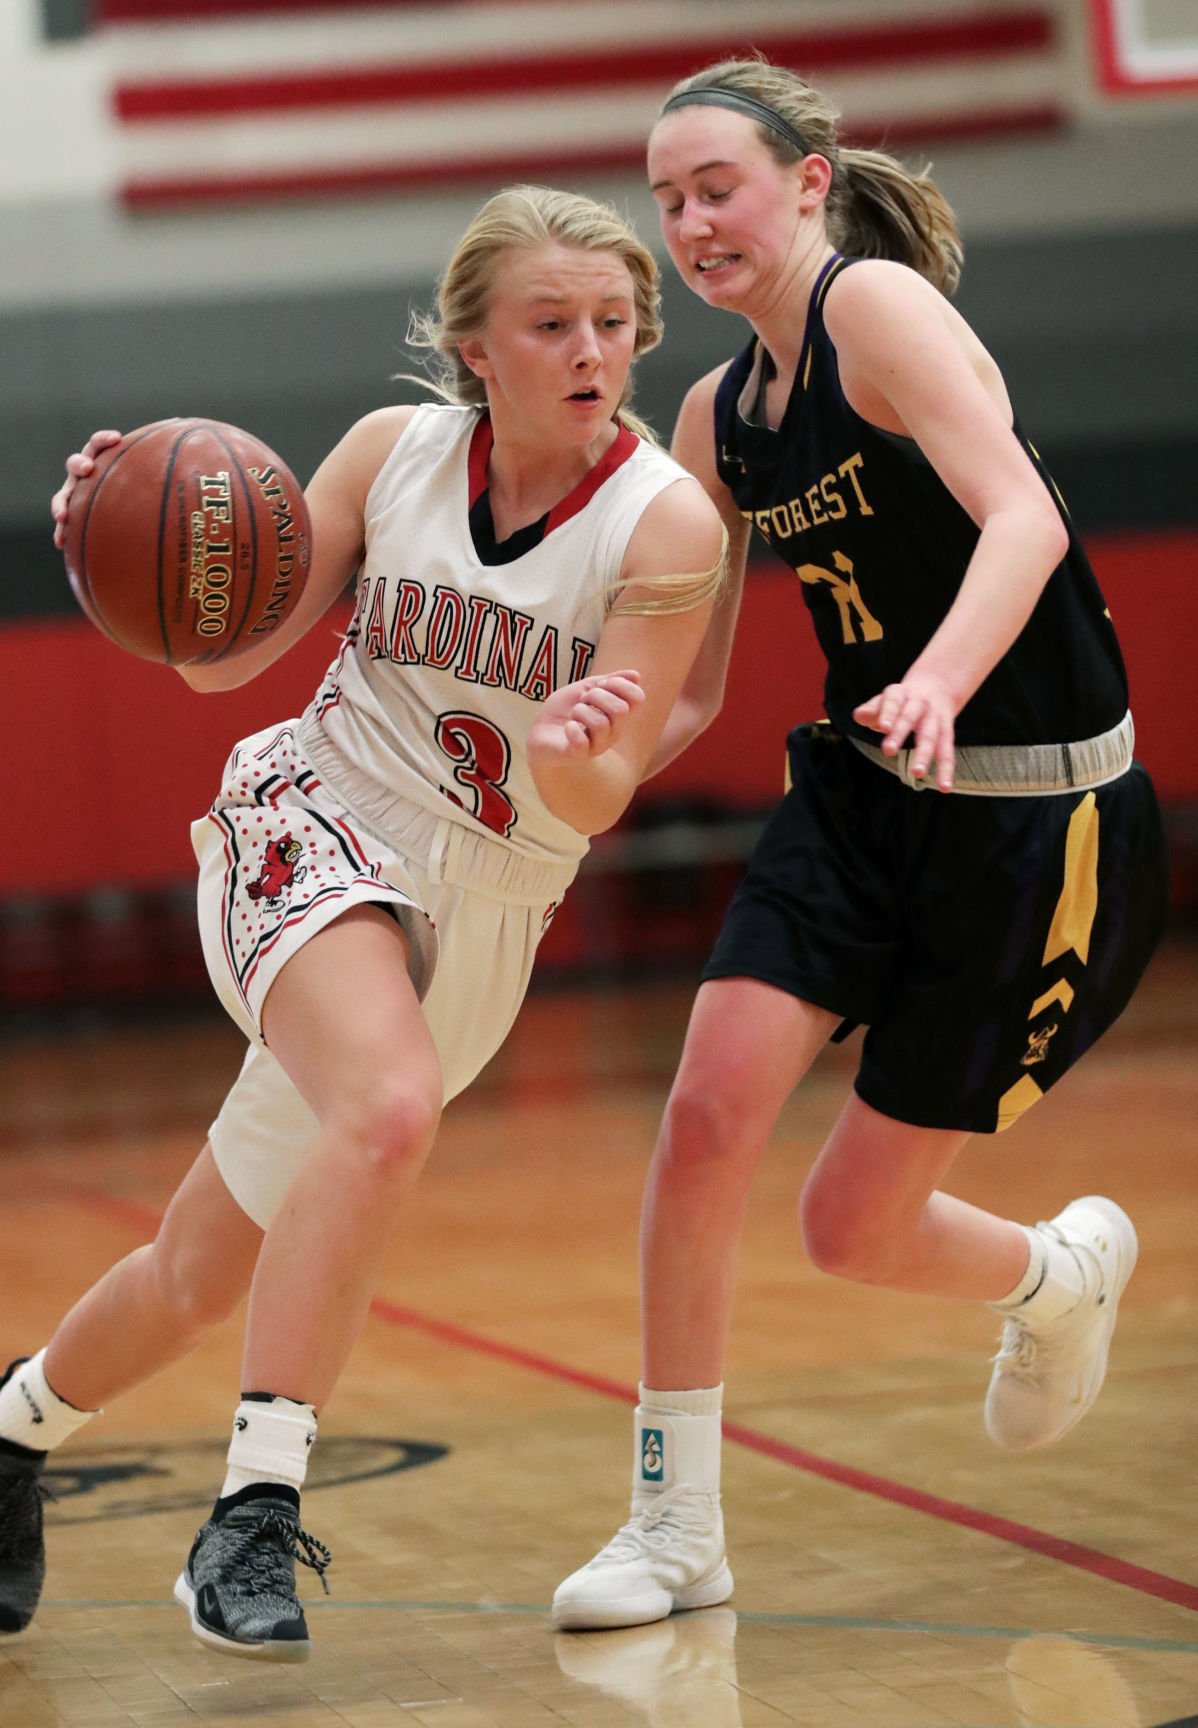 Prep girls basketball: Sun Prairie's Grace Hilber